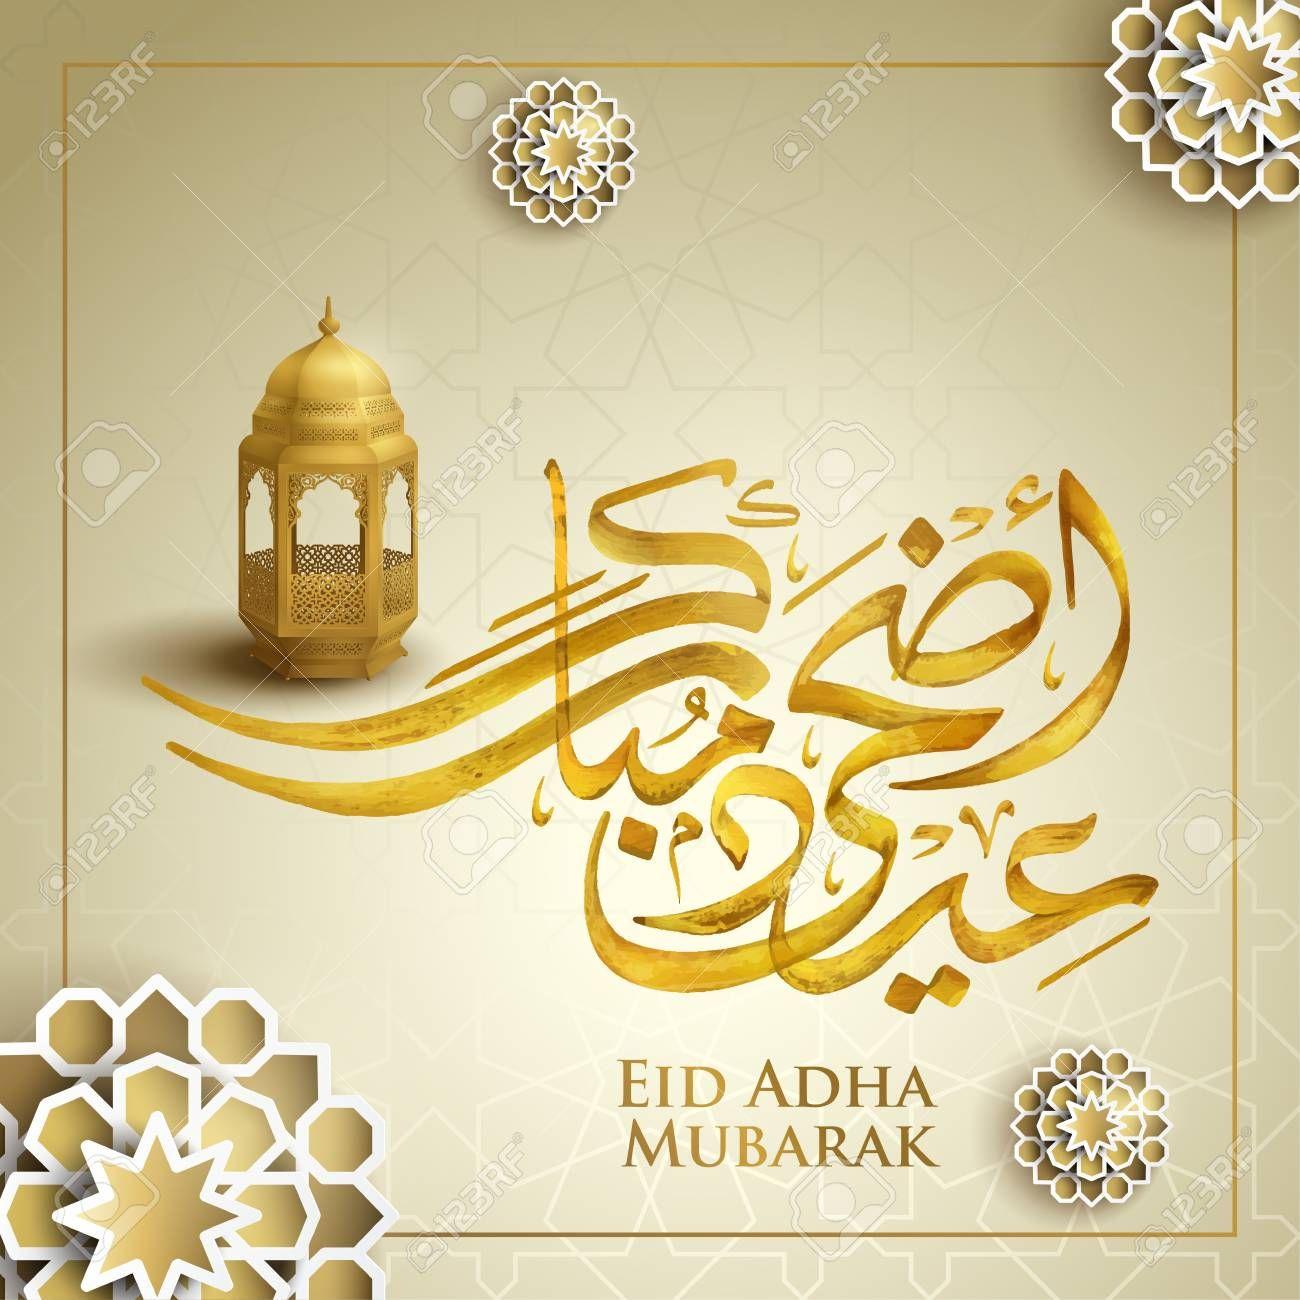 Eid Adha Mubarak Islamic Greeting Arabic Lantern And Calligraphy With Geometric Morocco Pattern Ad Islamic Greeting Mu Eid Adha Mubarak Eid Photos Eid